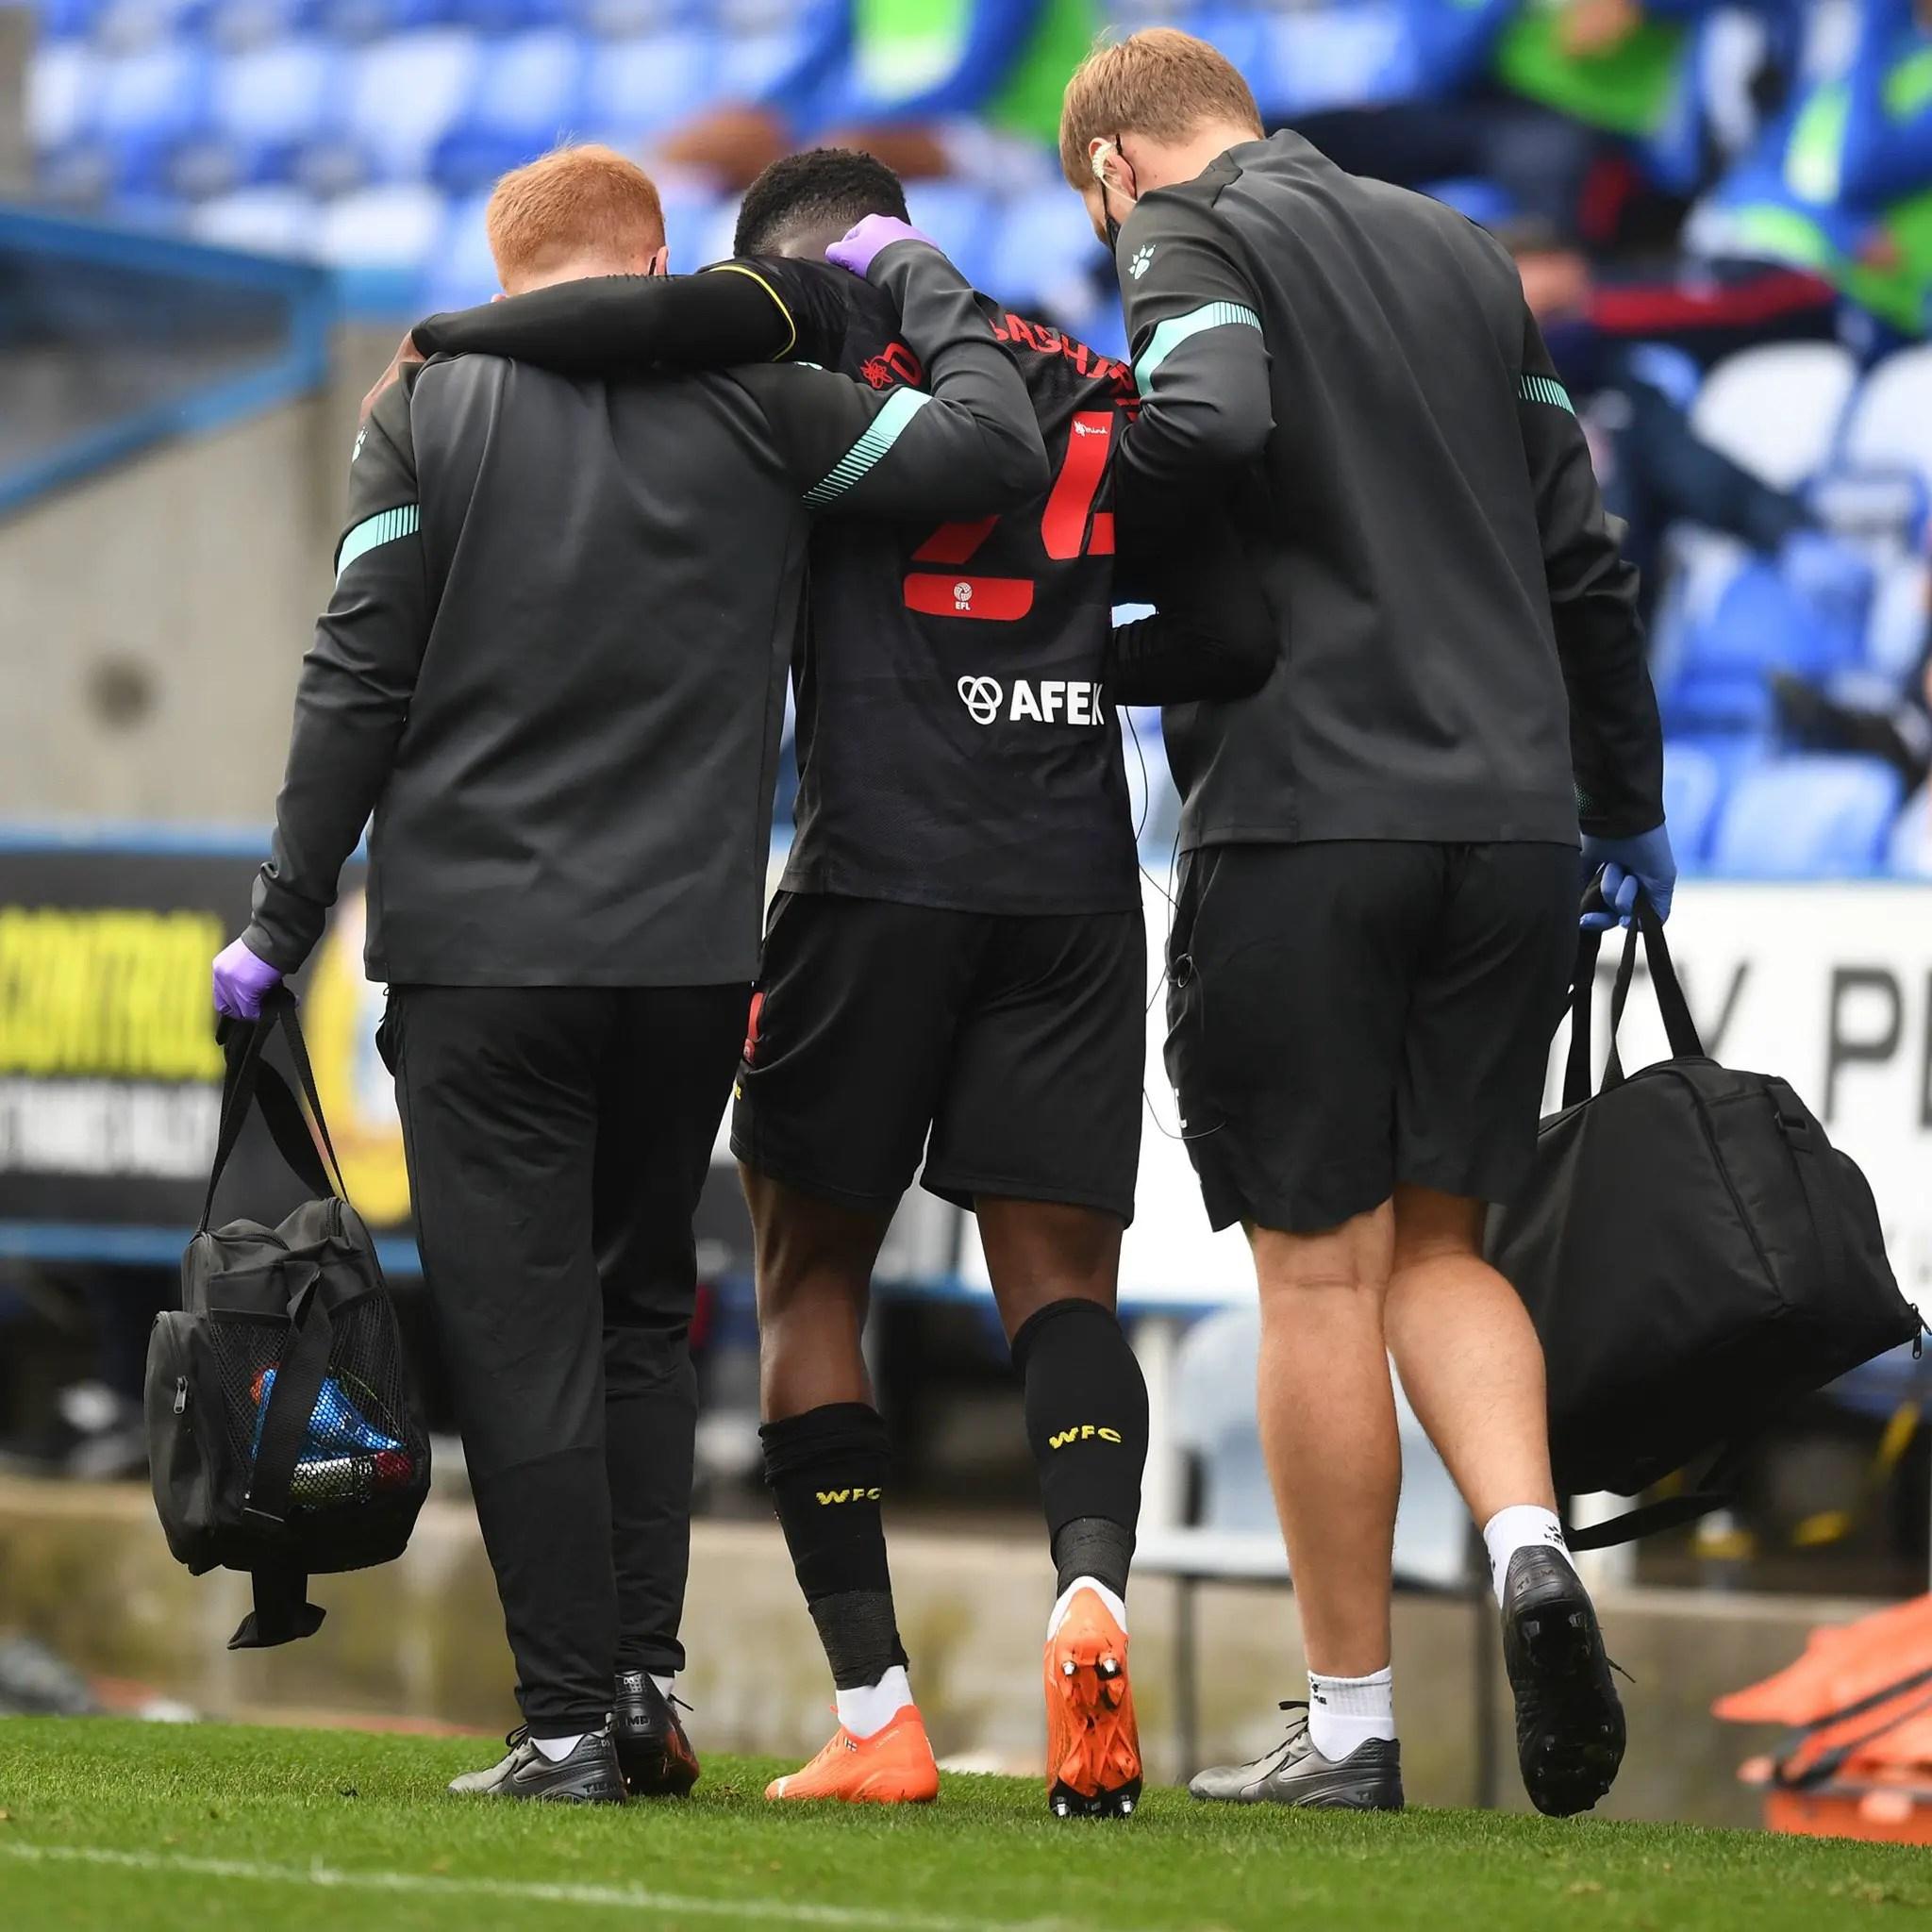 Dele-Bashiru Returns To Watford Training After Lengthy Injury Layoff